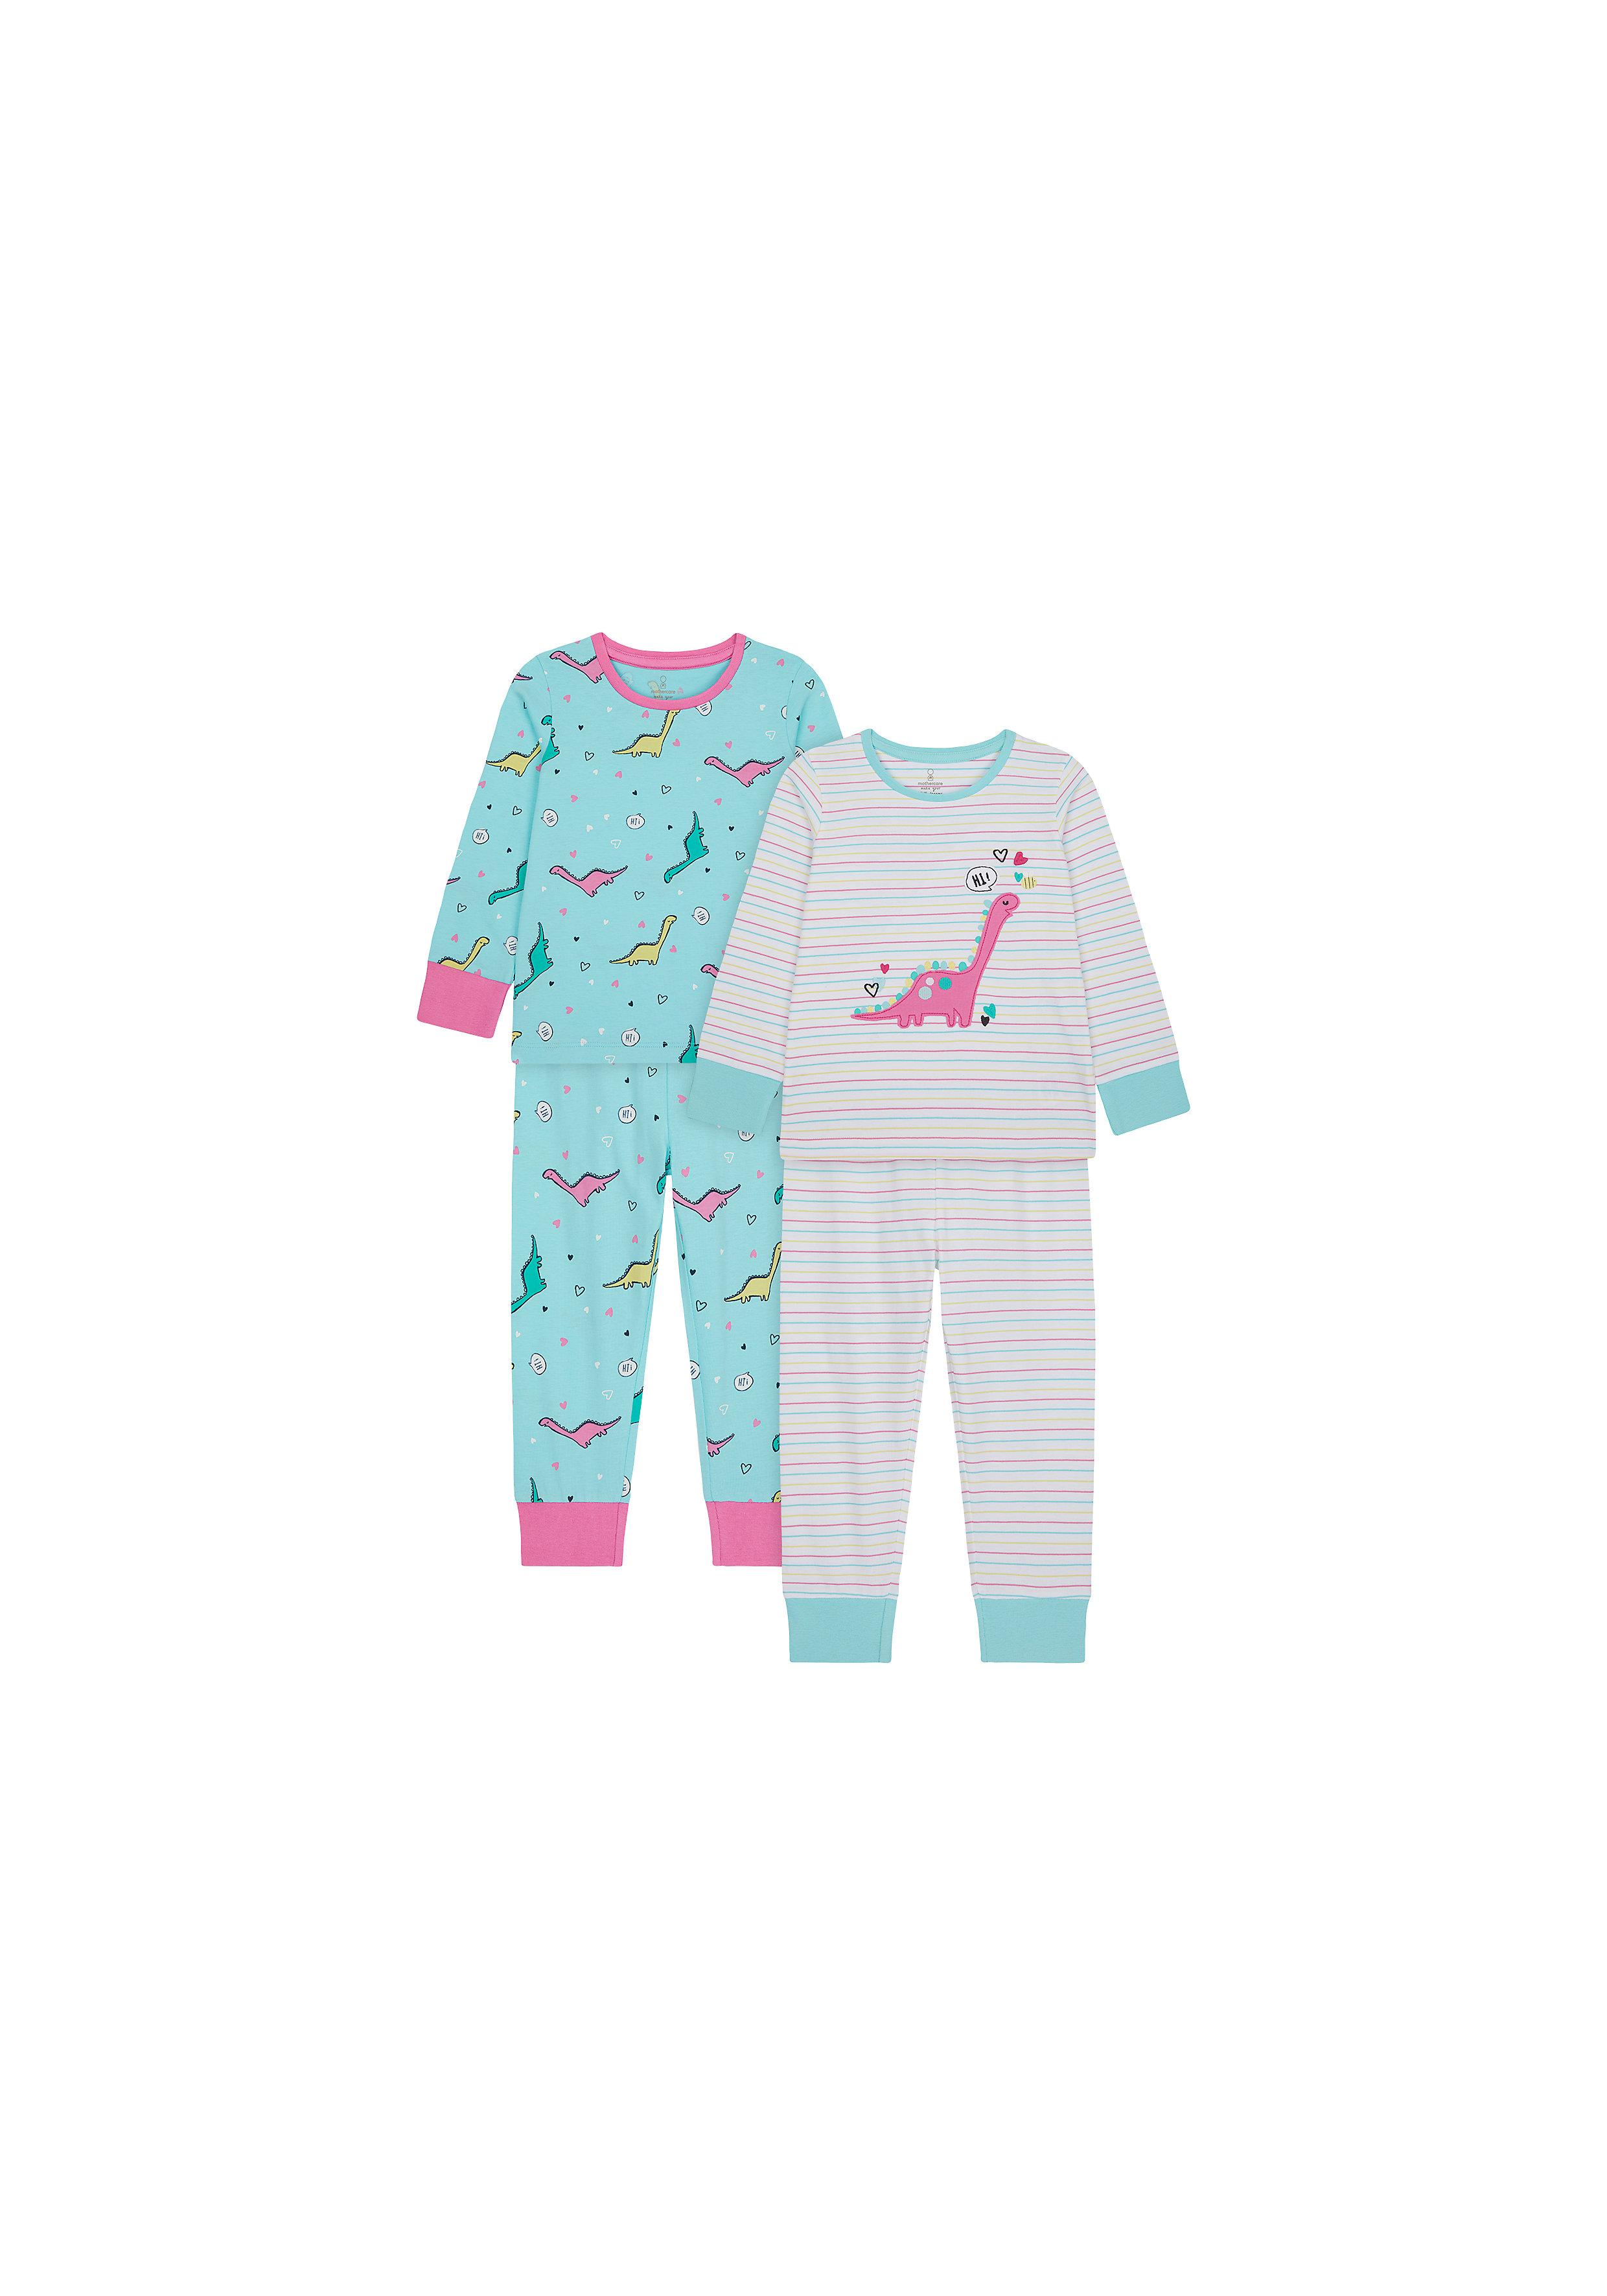 Mothercare | Girls Full Sleeves Pyjama Set Dino Patchwork - Pack Of 2 - Blue White